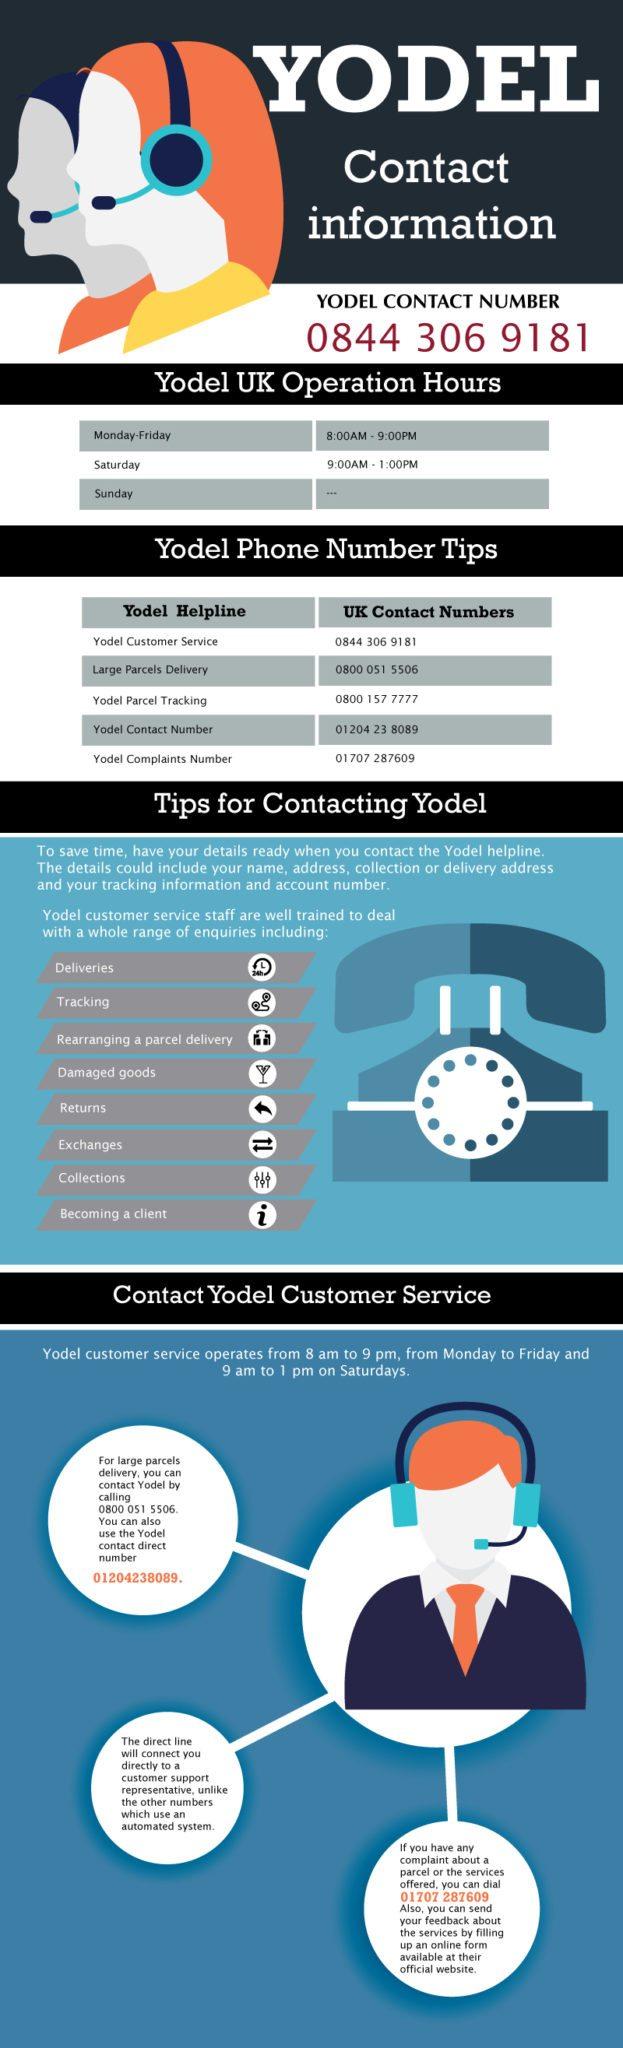 Yodel Customer Service